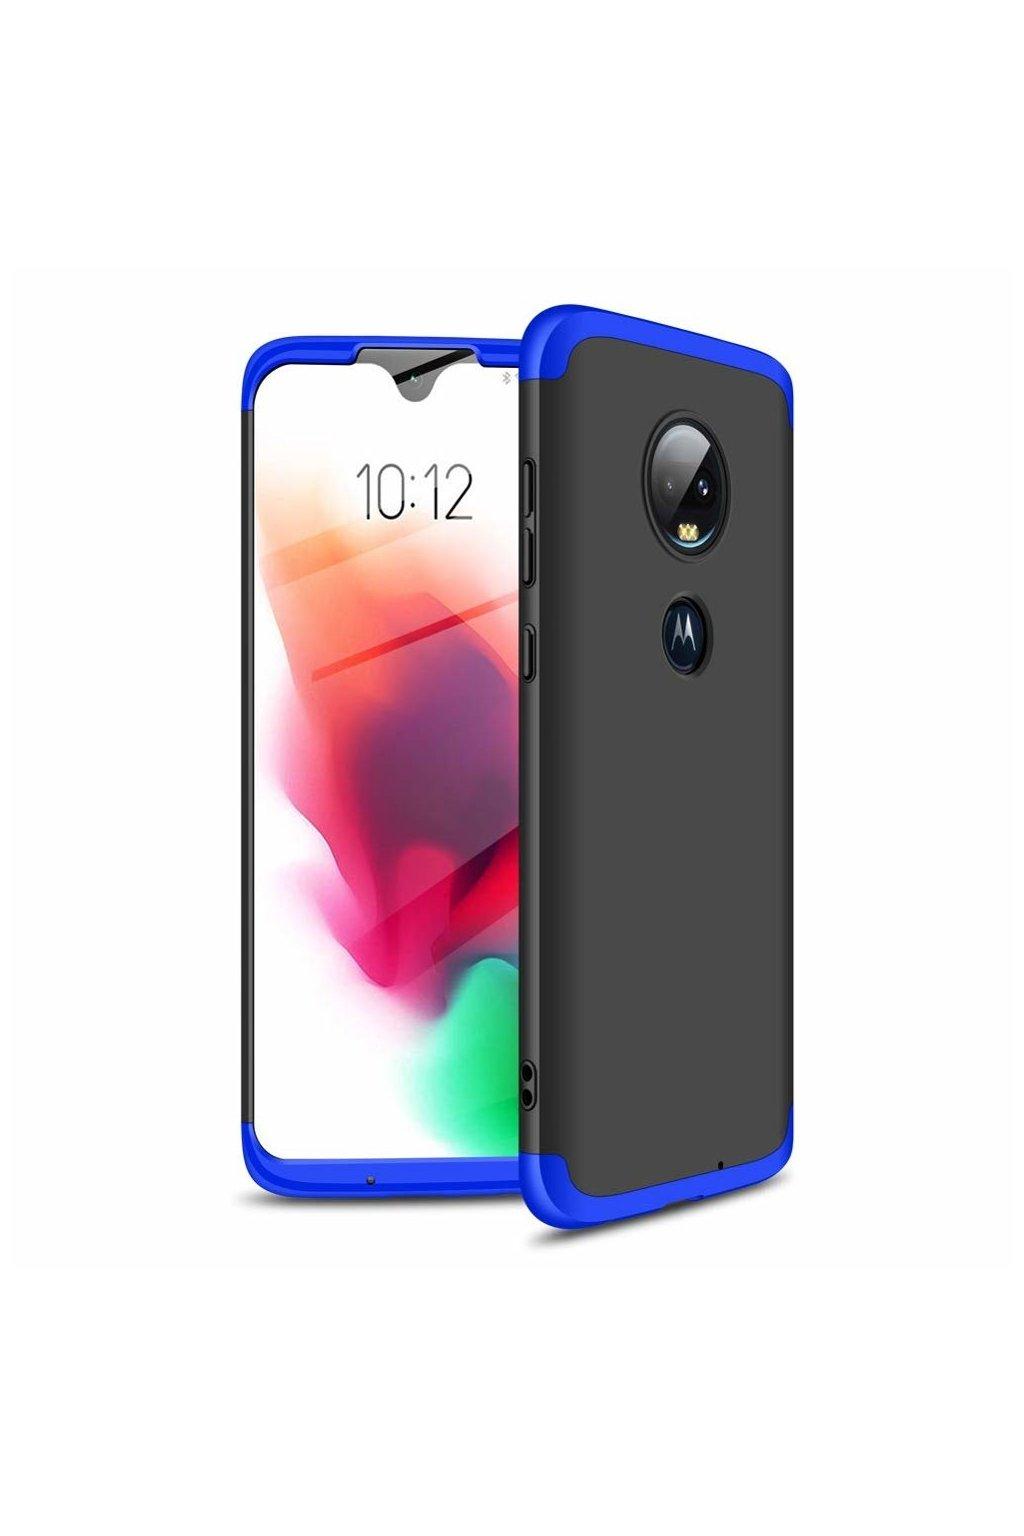 eng pl GKK 360 Protection Case Front and Back Case Full Body Cover Motorola Moto G7 black blue 46547 1